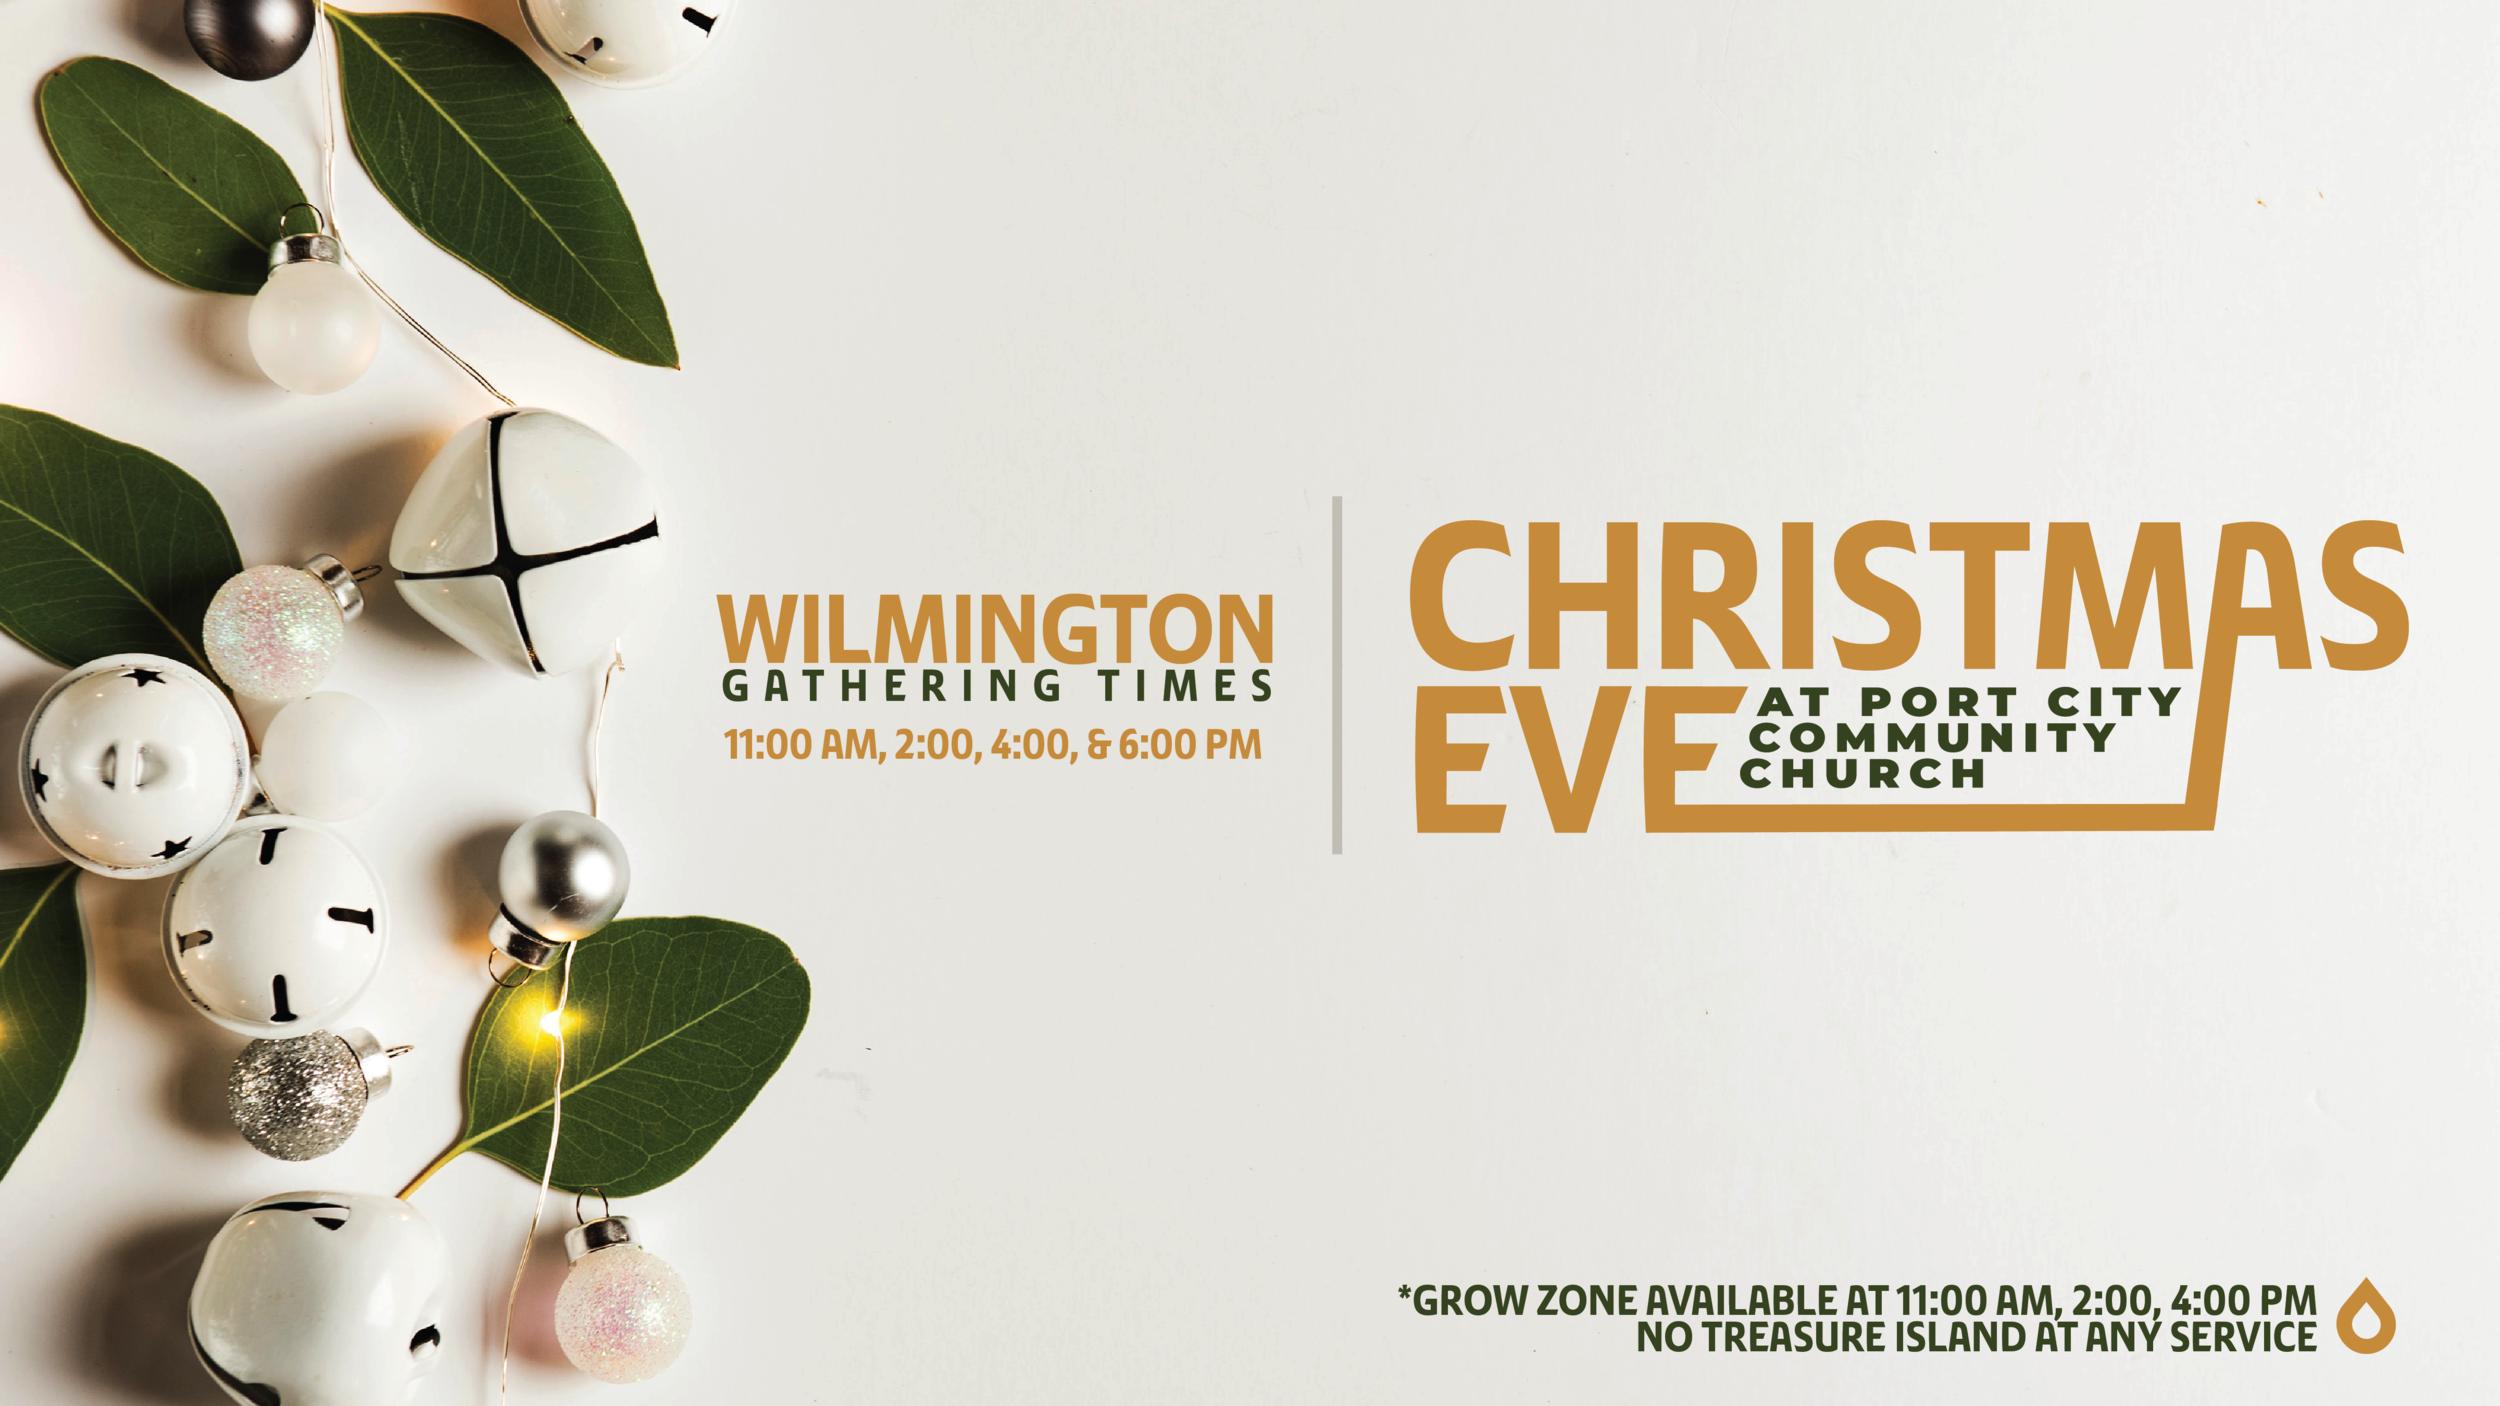 Christmas Eve Service — Port City Community Church Wilmington